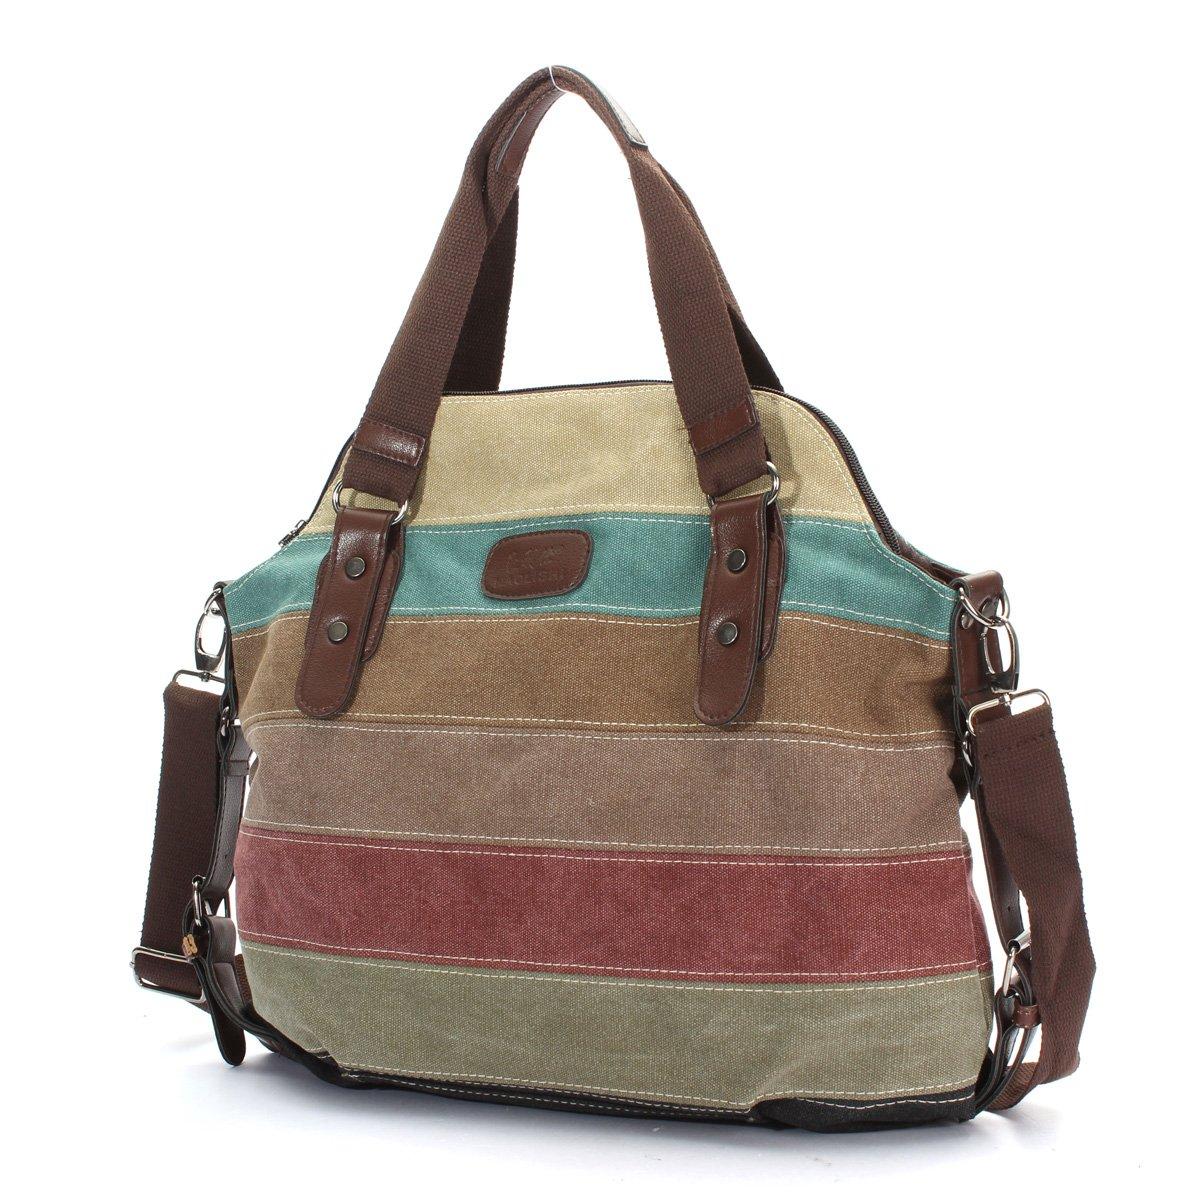 13caf47fe3bf Amazon.com  OURBAG Women Canvas Stripe Handbag Cross body Shoulder Bags Tote  Satchel Messenger Bag Colorful  Clothing